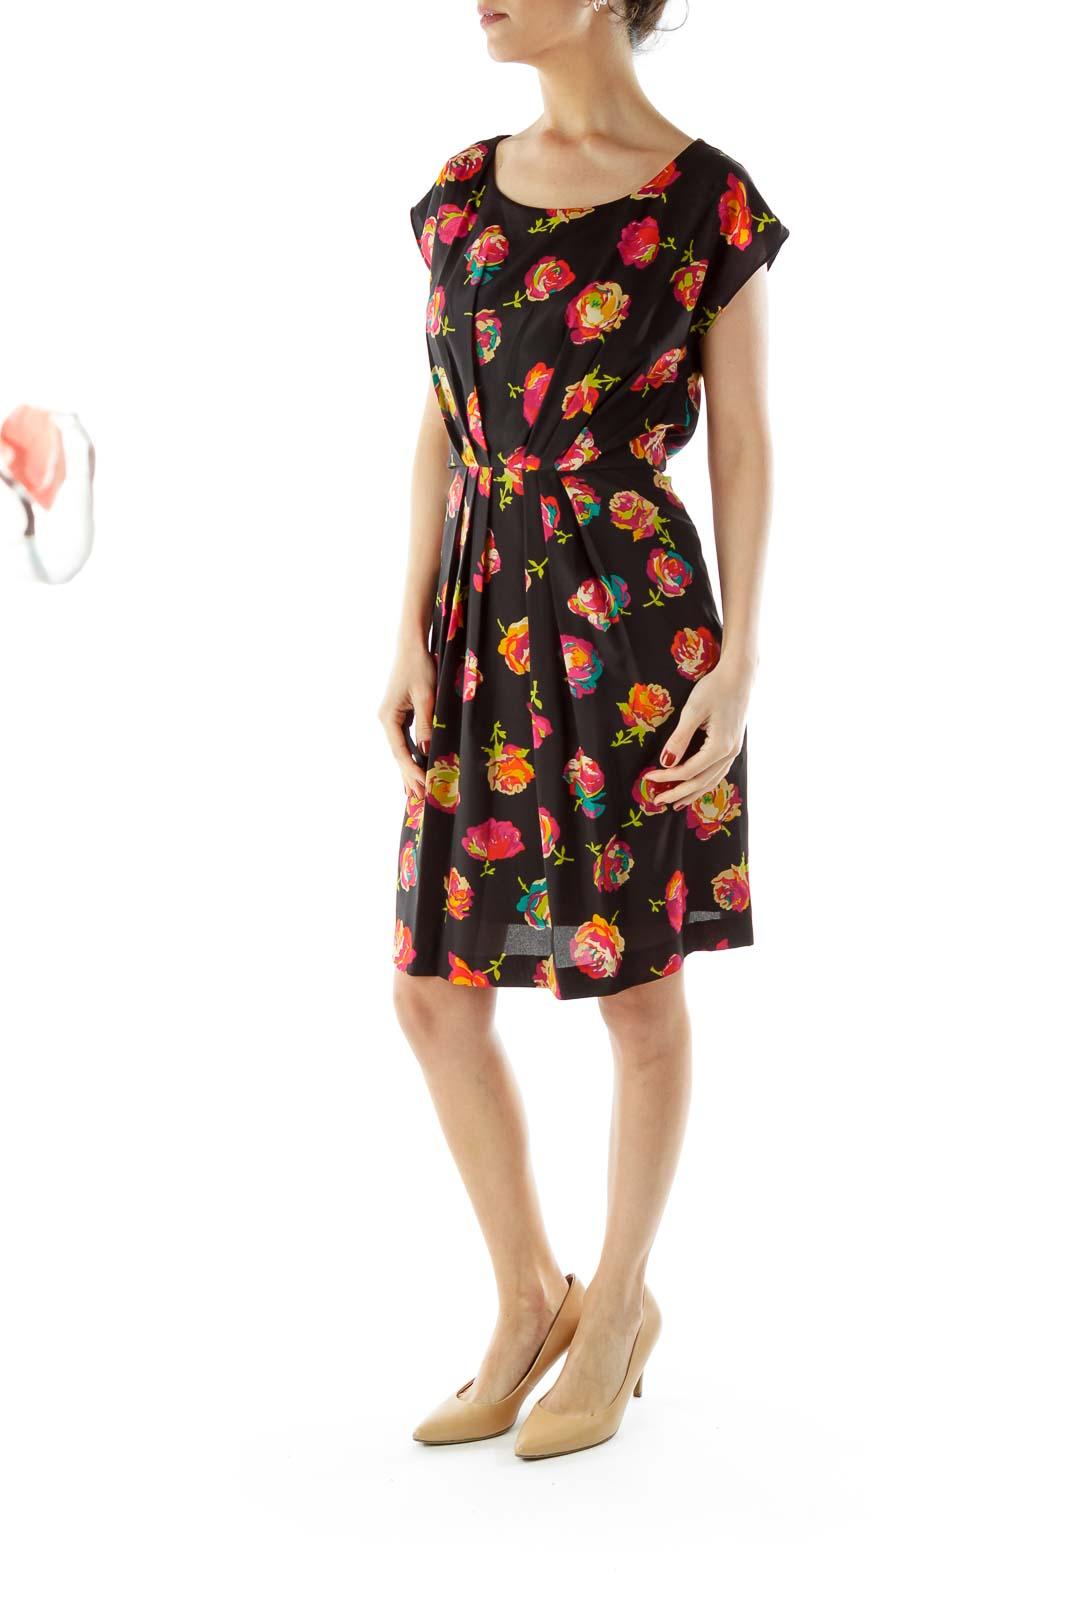 Black Floral Print Day Dress